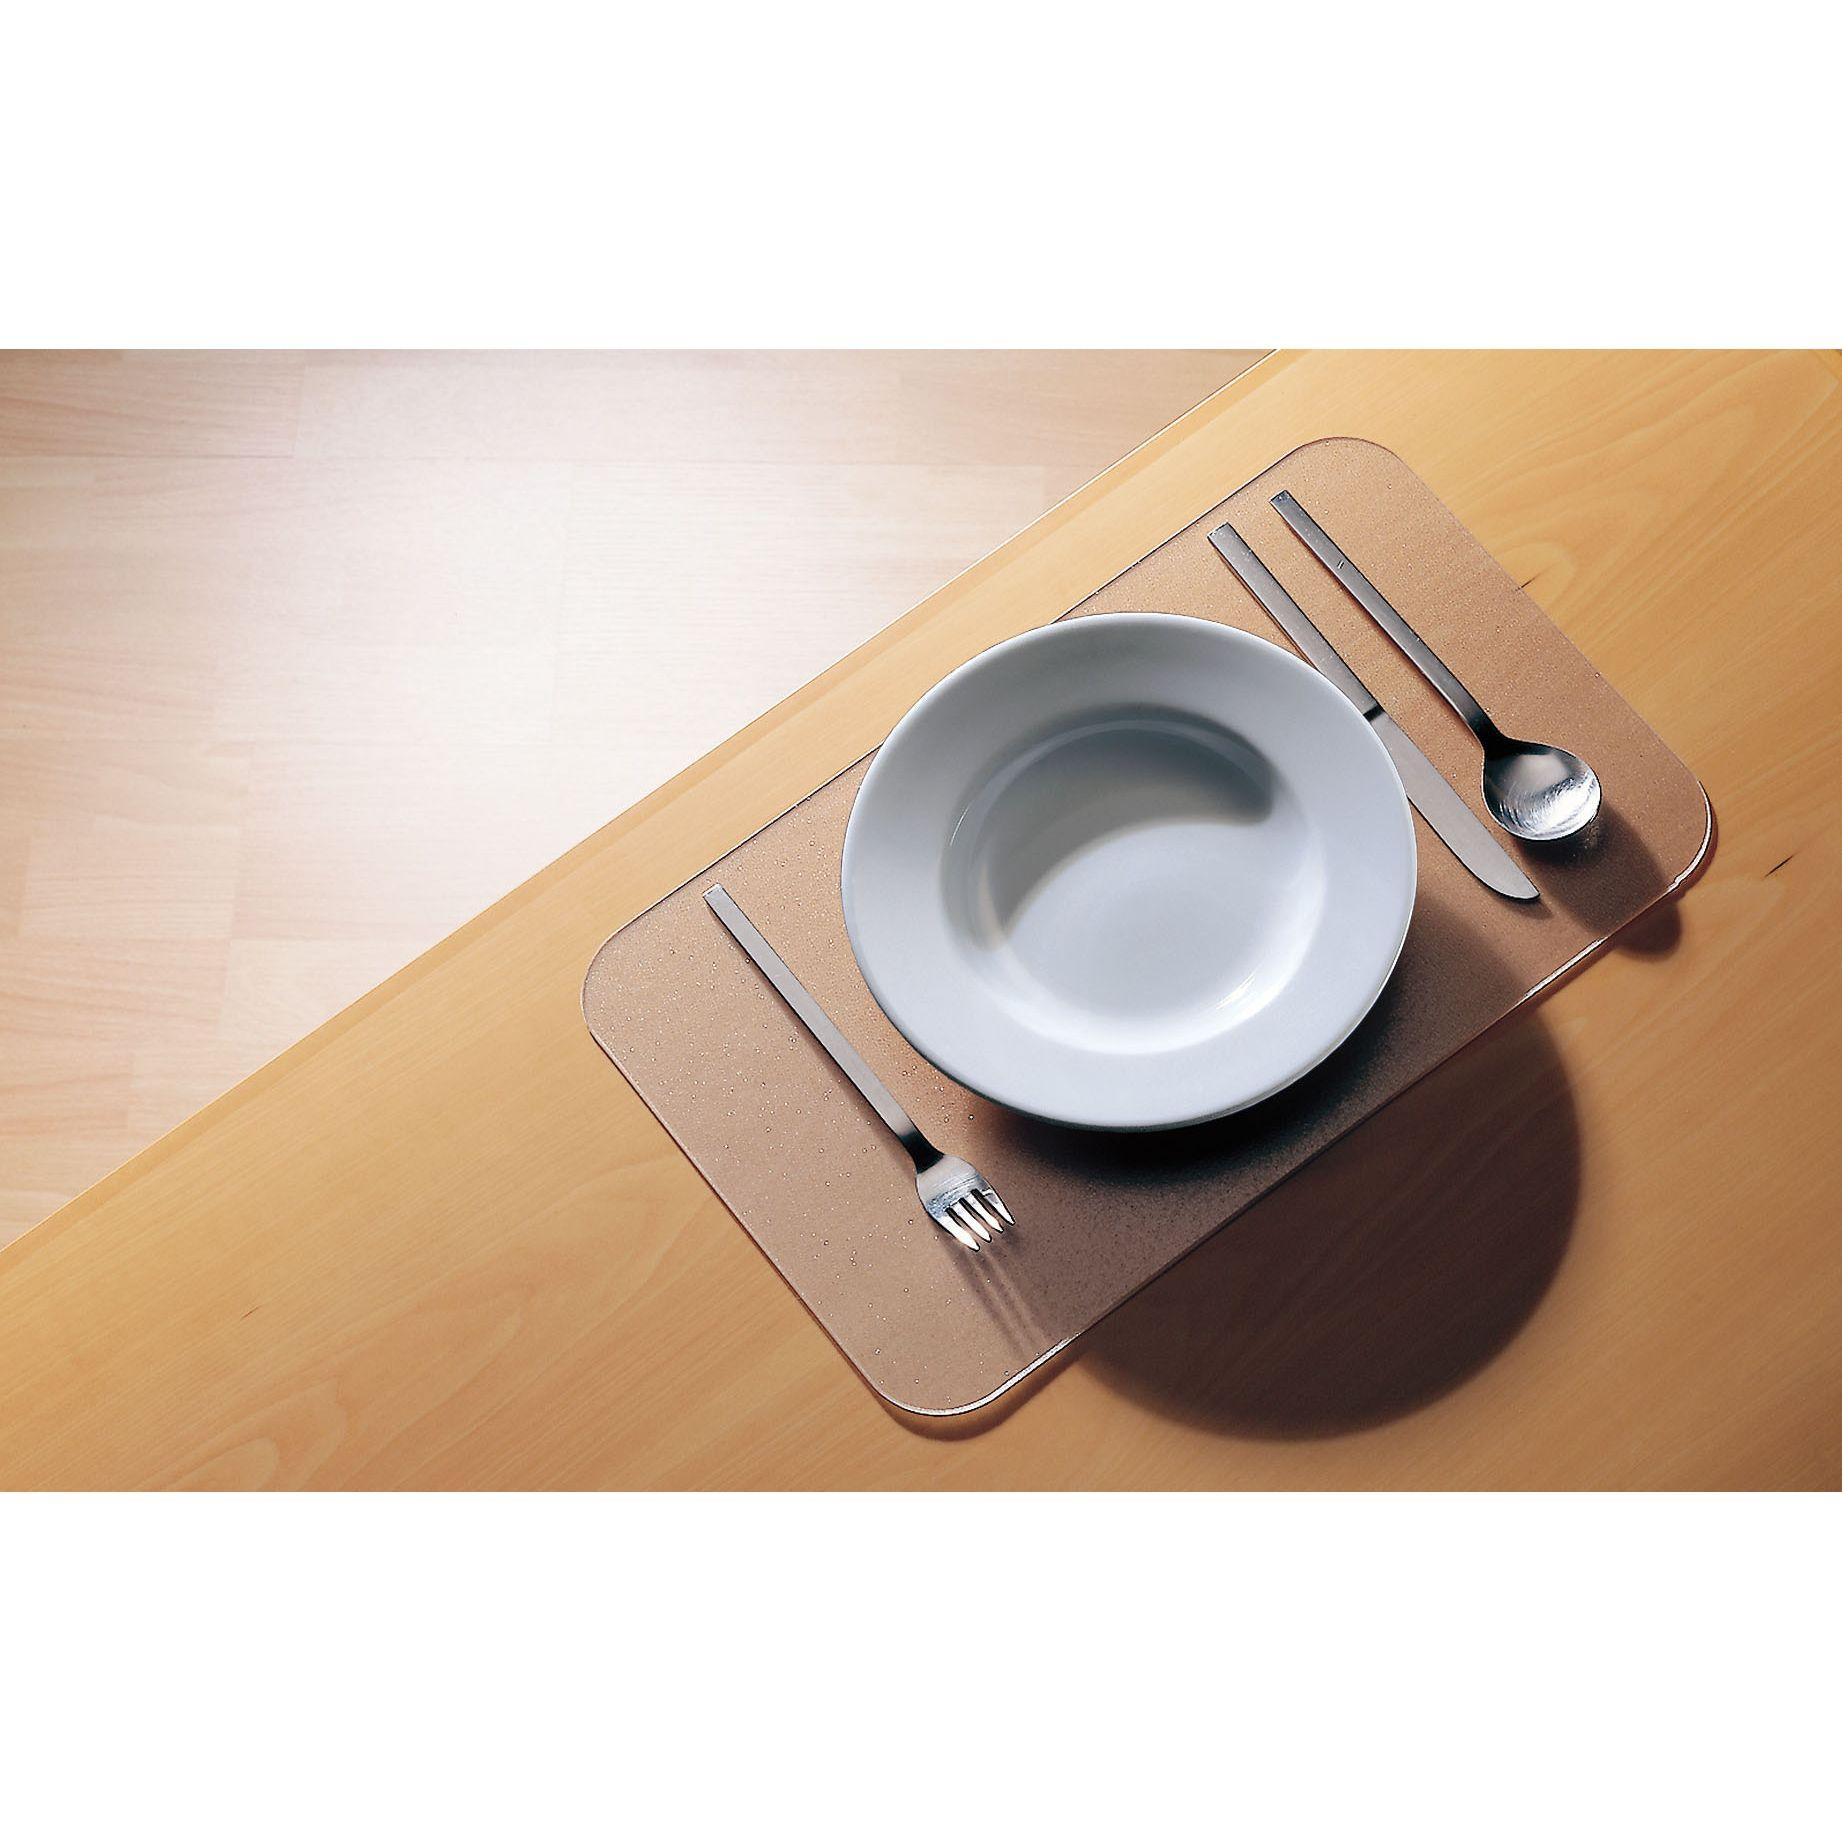 Tisch | wertlegen.de